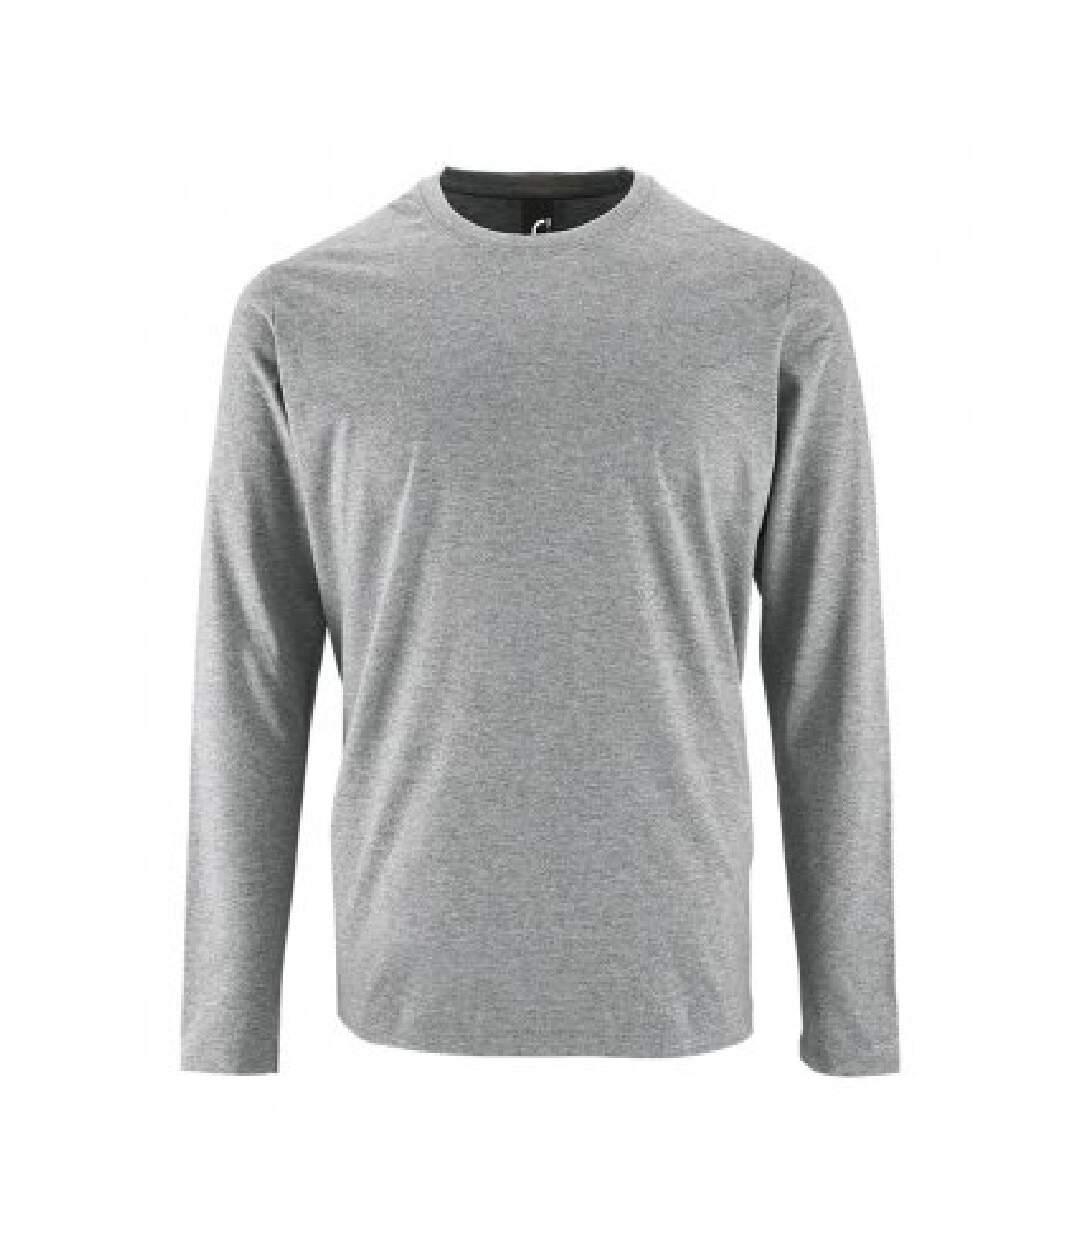 SOLS Mens Imperial Long Sleeve T-Shirt (Grey Marl) - UTPC2905